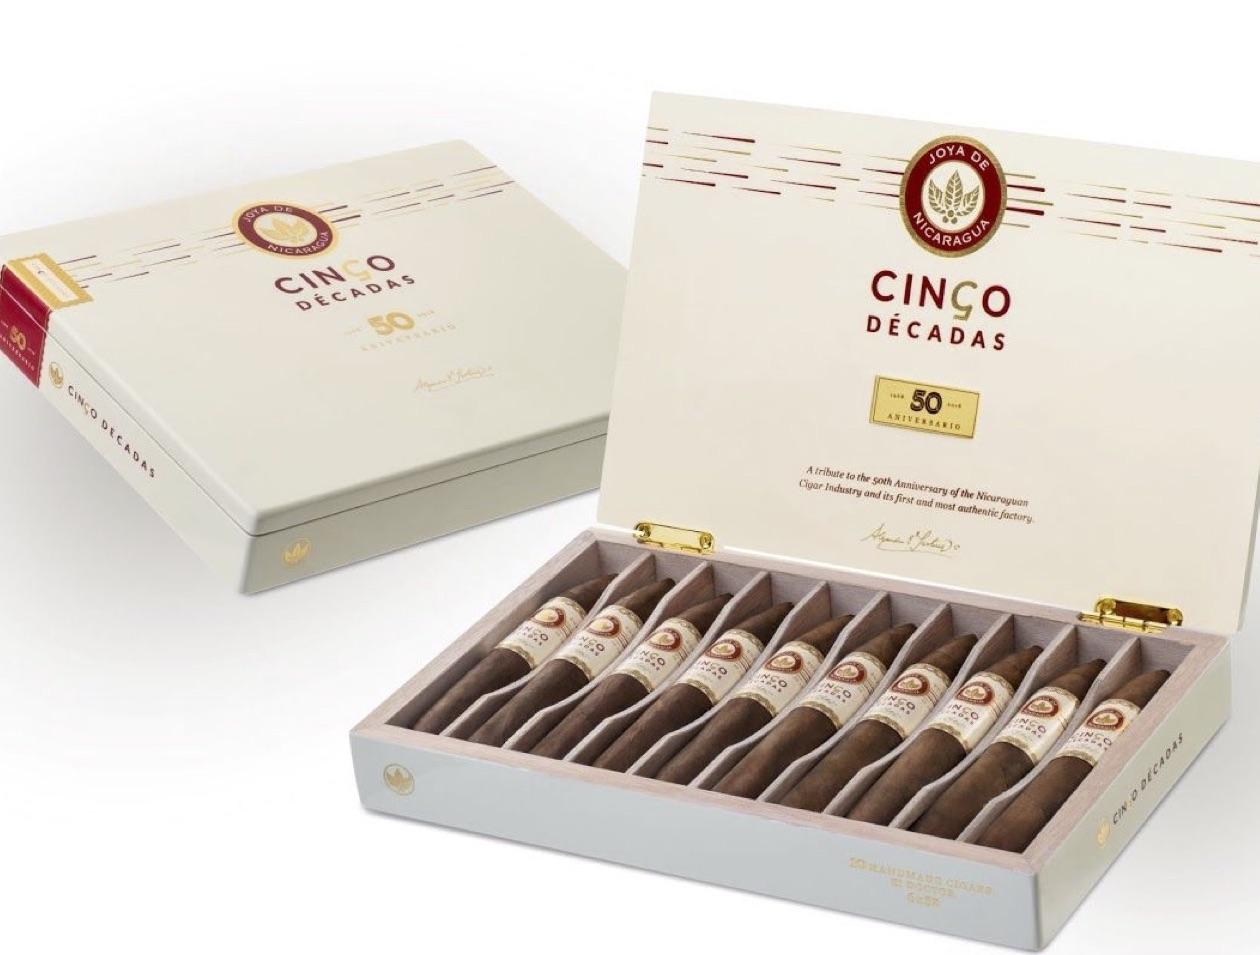 Cigar News: Joya de Nicaragua Cinco Décadas El Doctor Coming This Summer